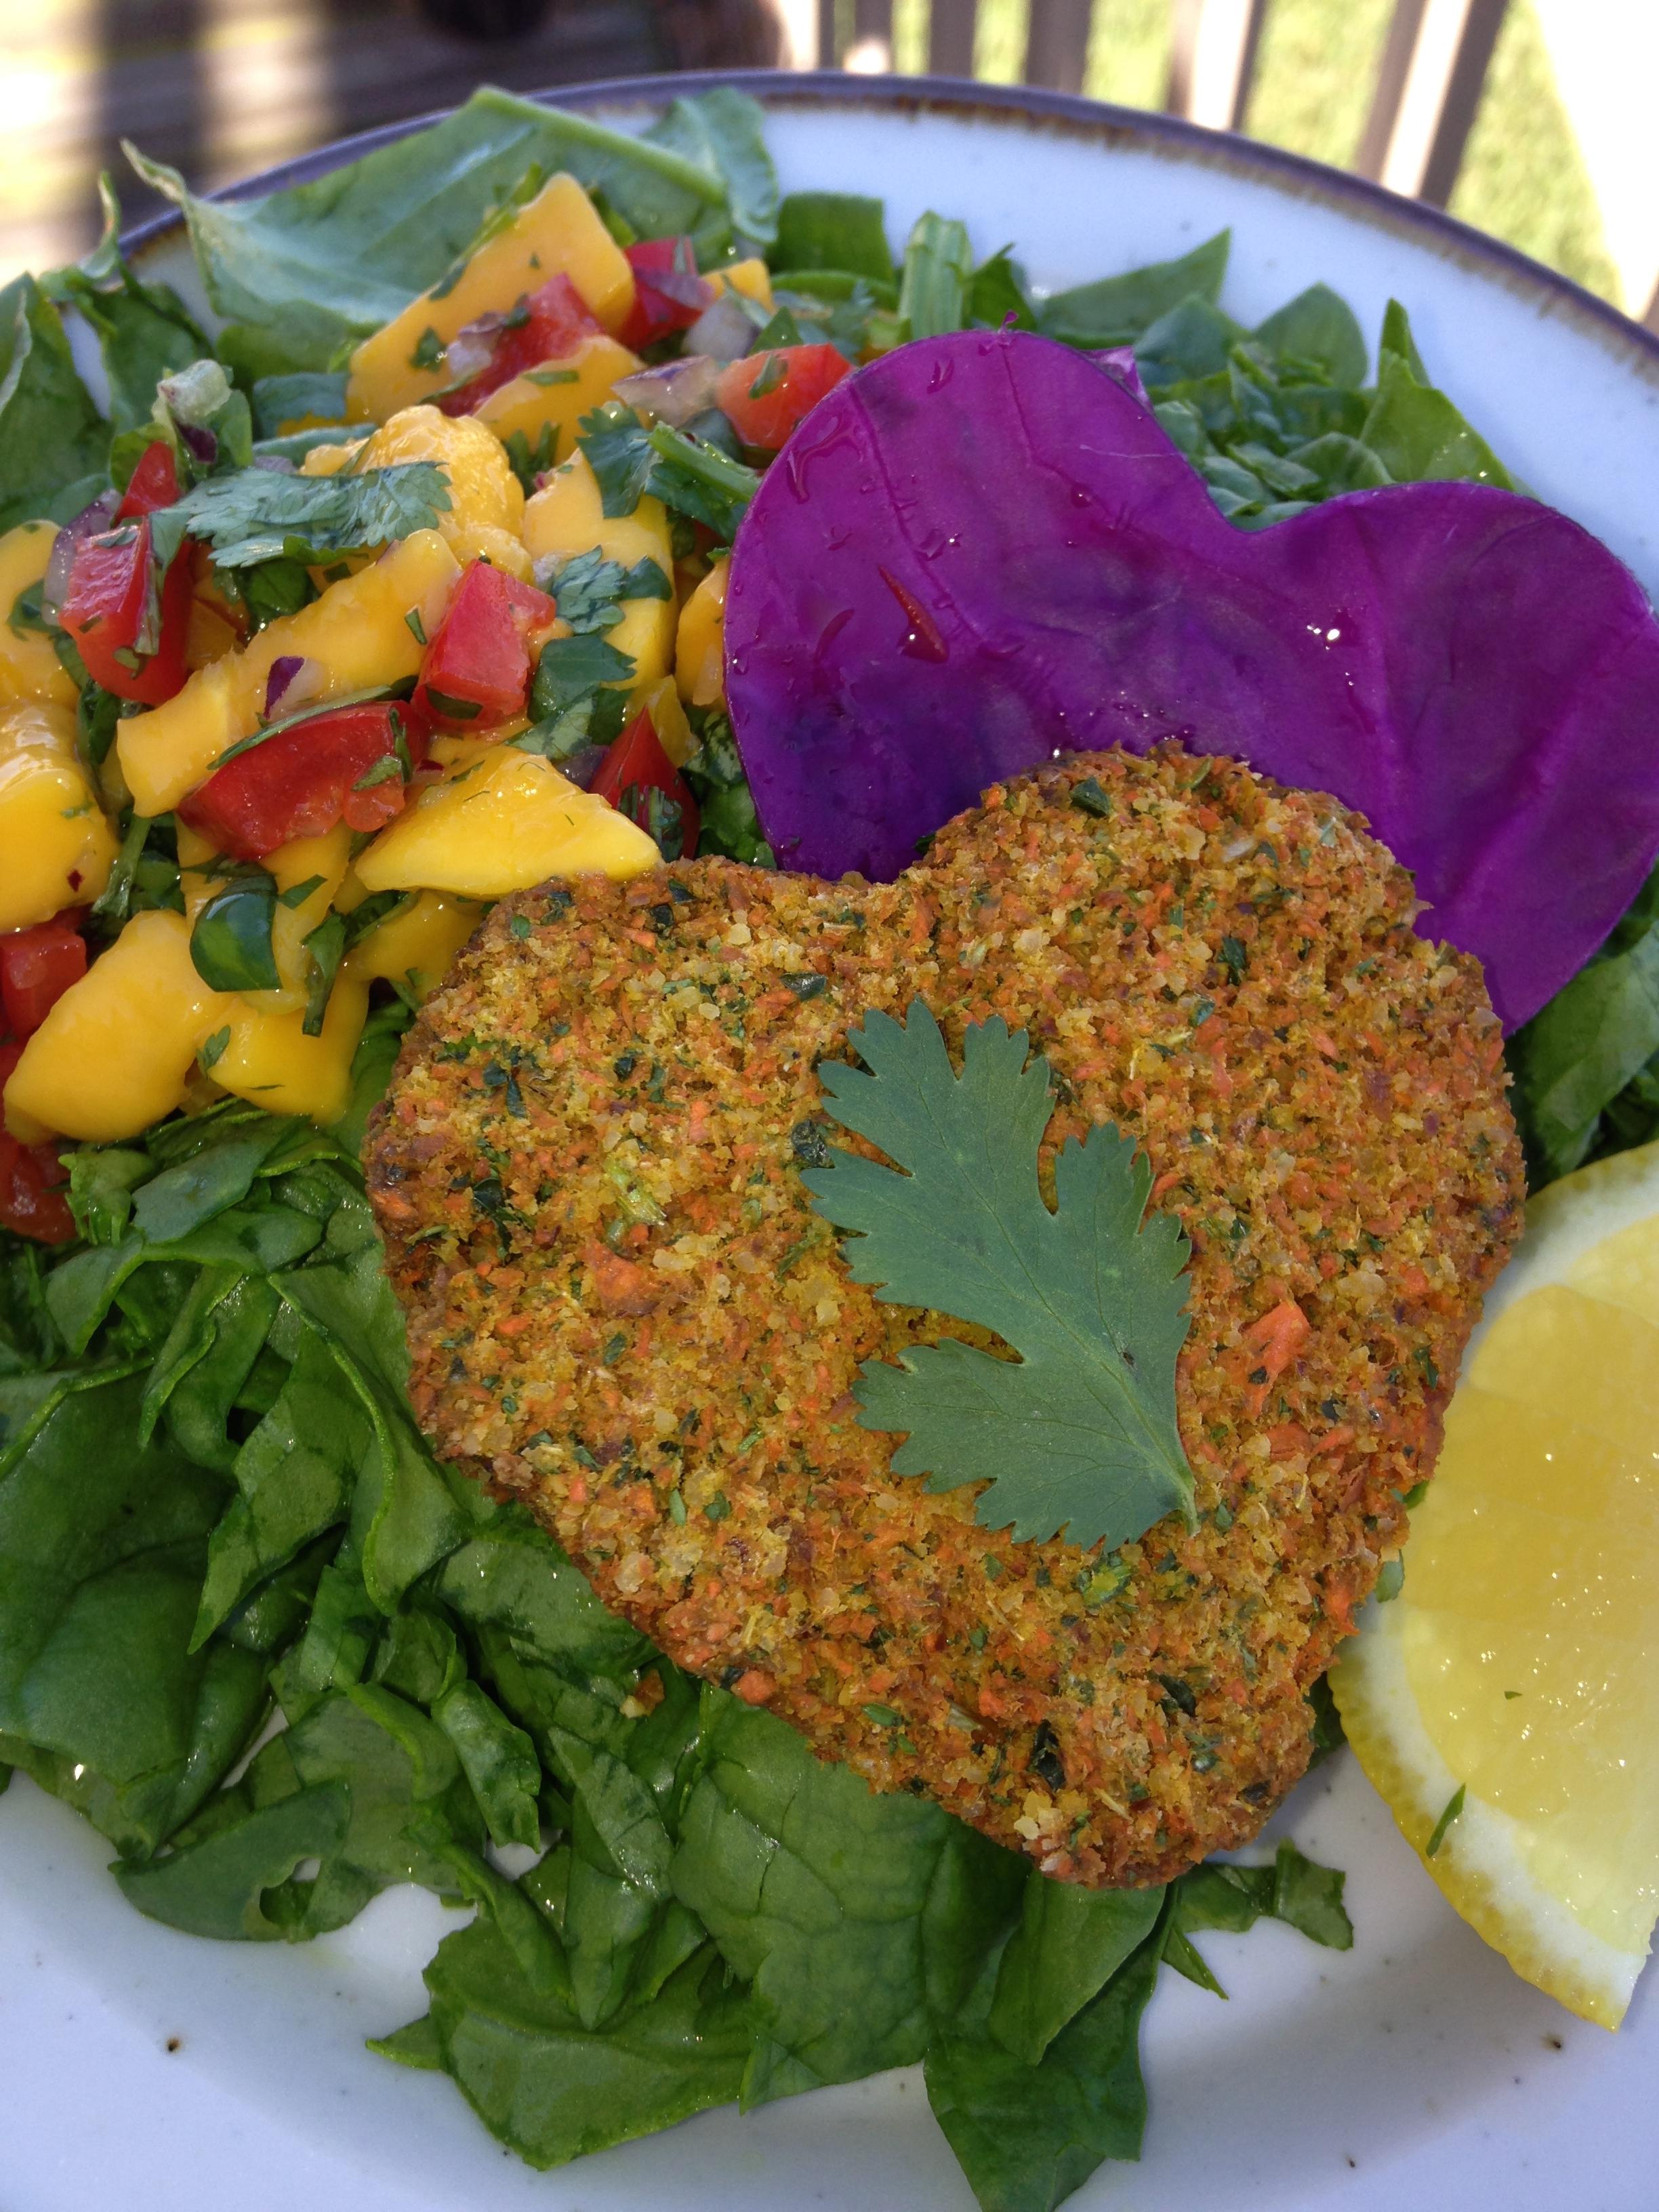 Raw Vegan Salmon Patty